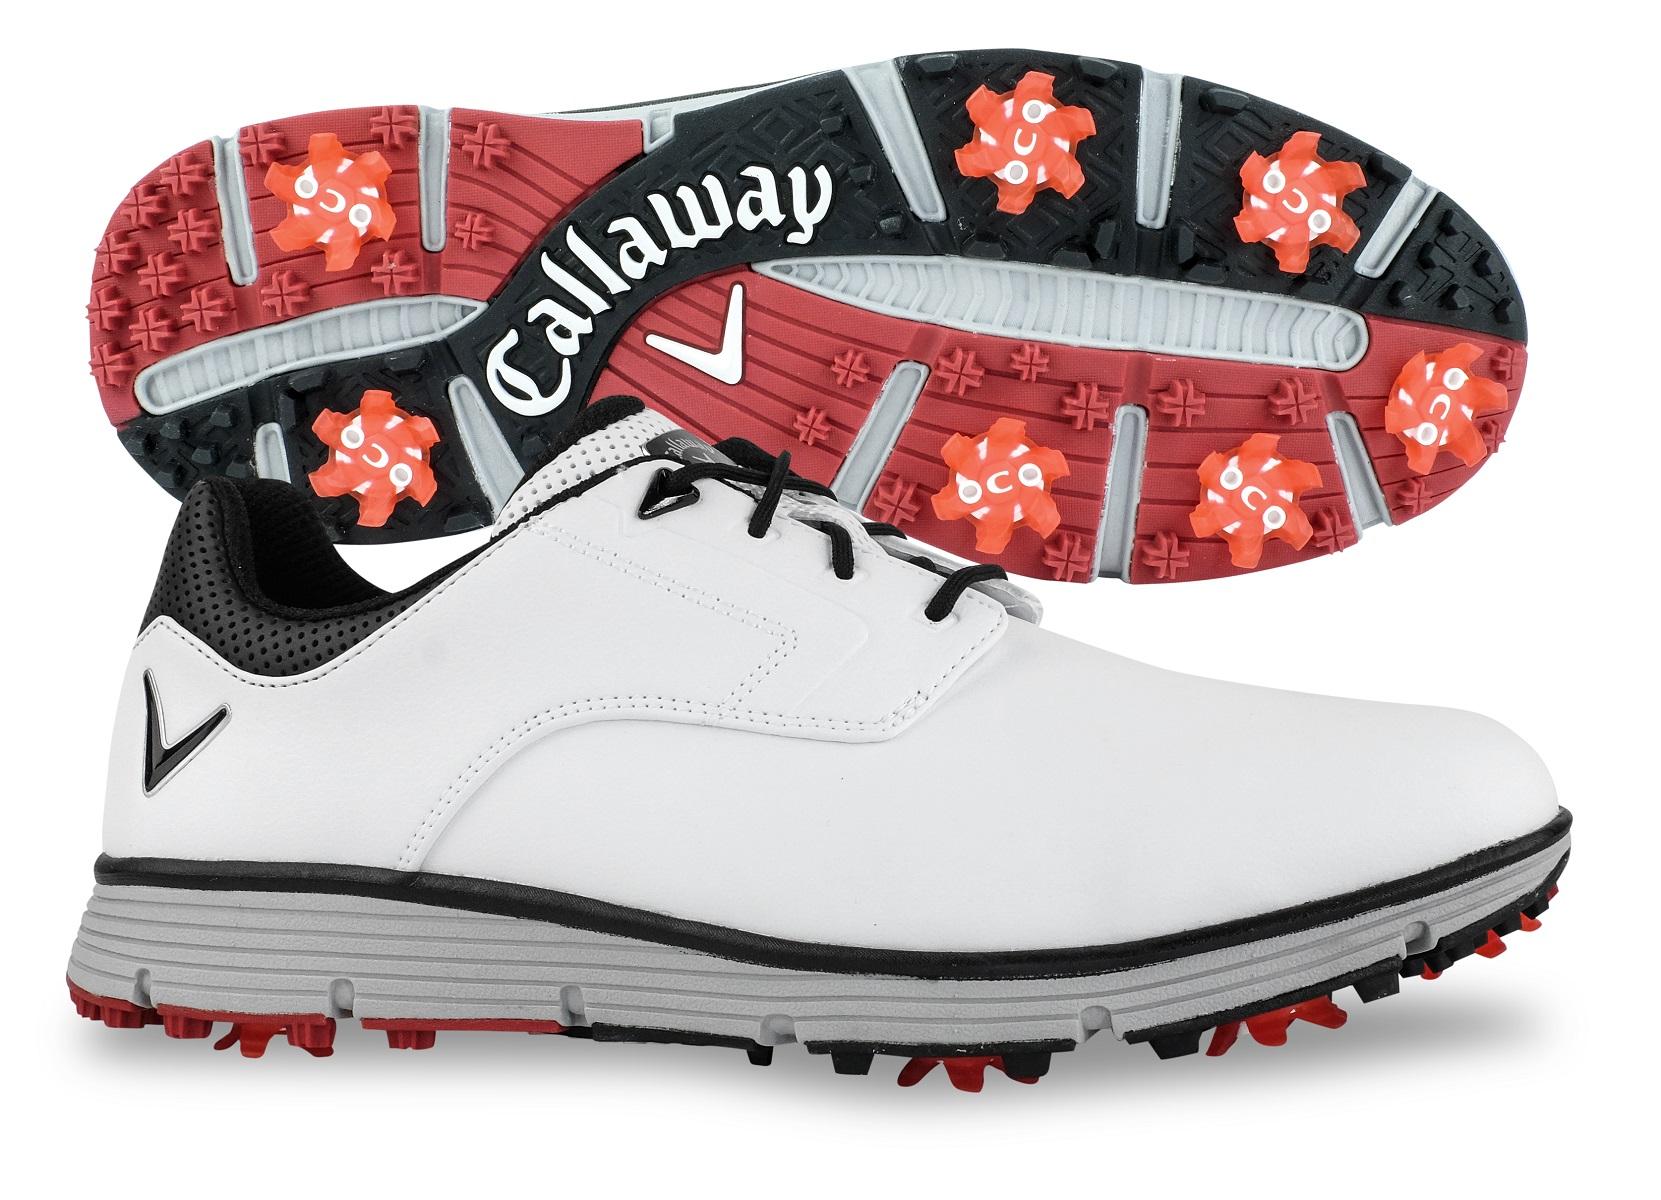 New Callaway Golf- La Jolla Shoes White Size 11.5 Medium CG2